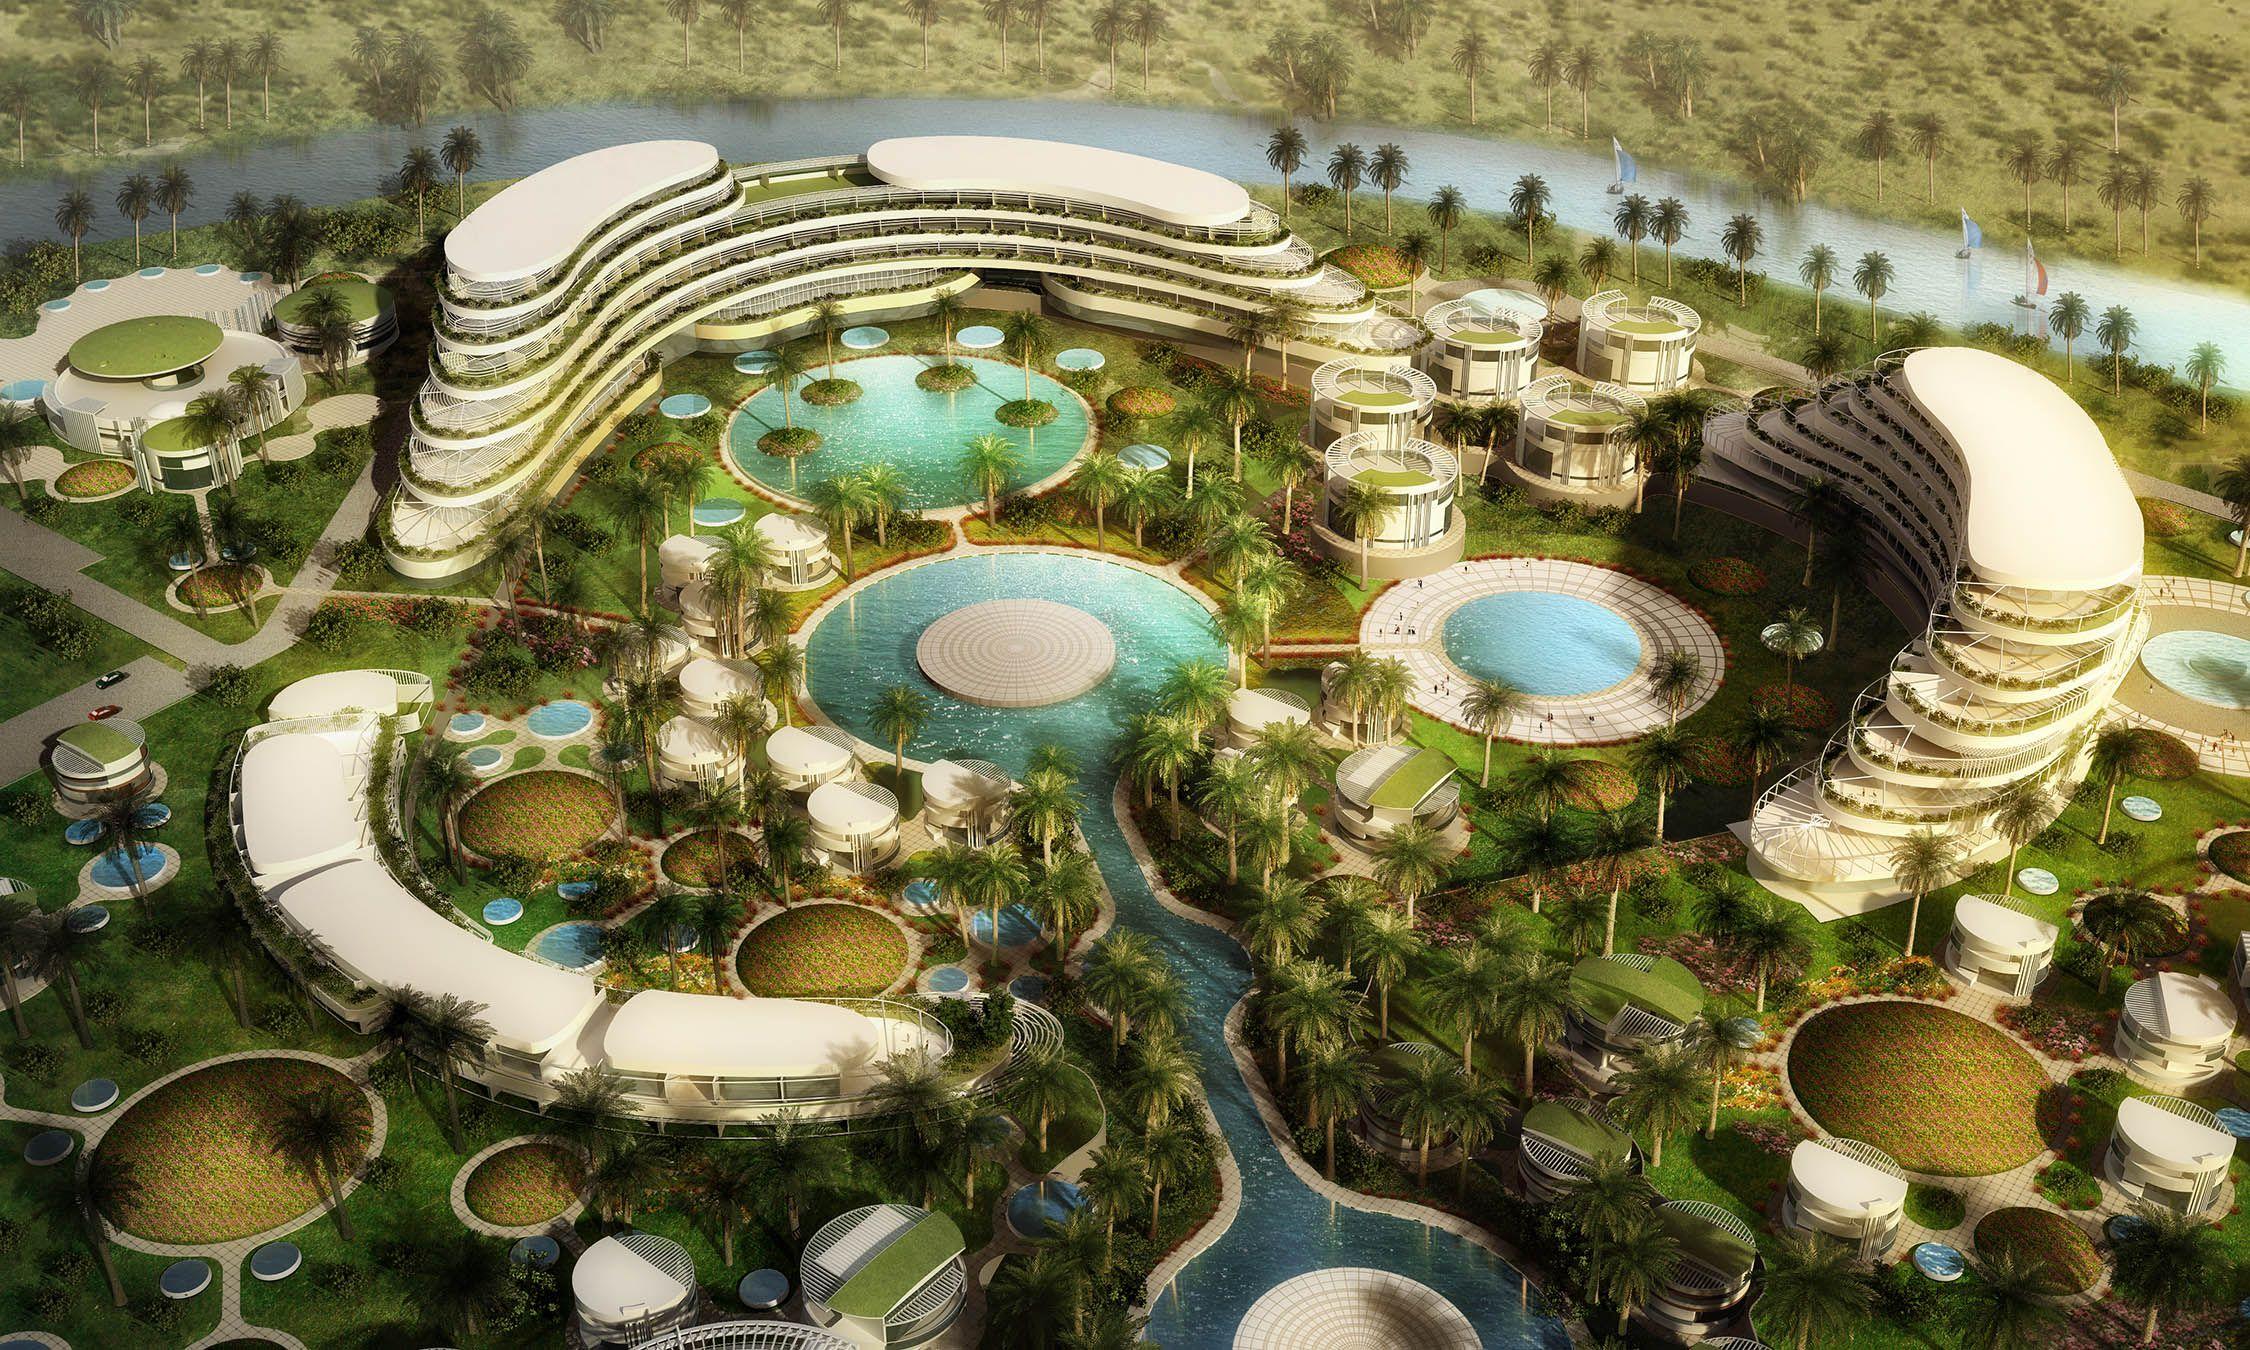 Al Ain Hilton Hotel Master Plan